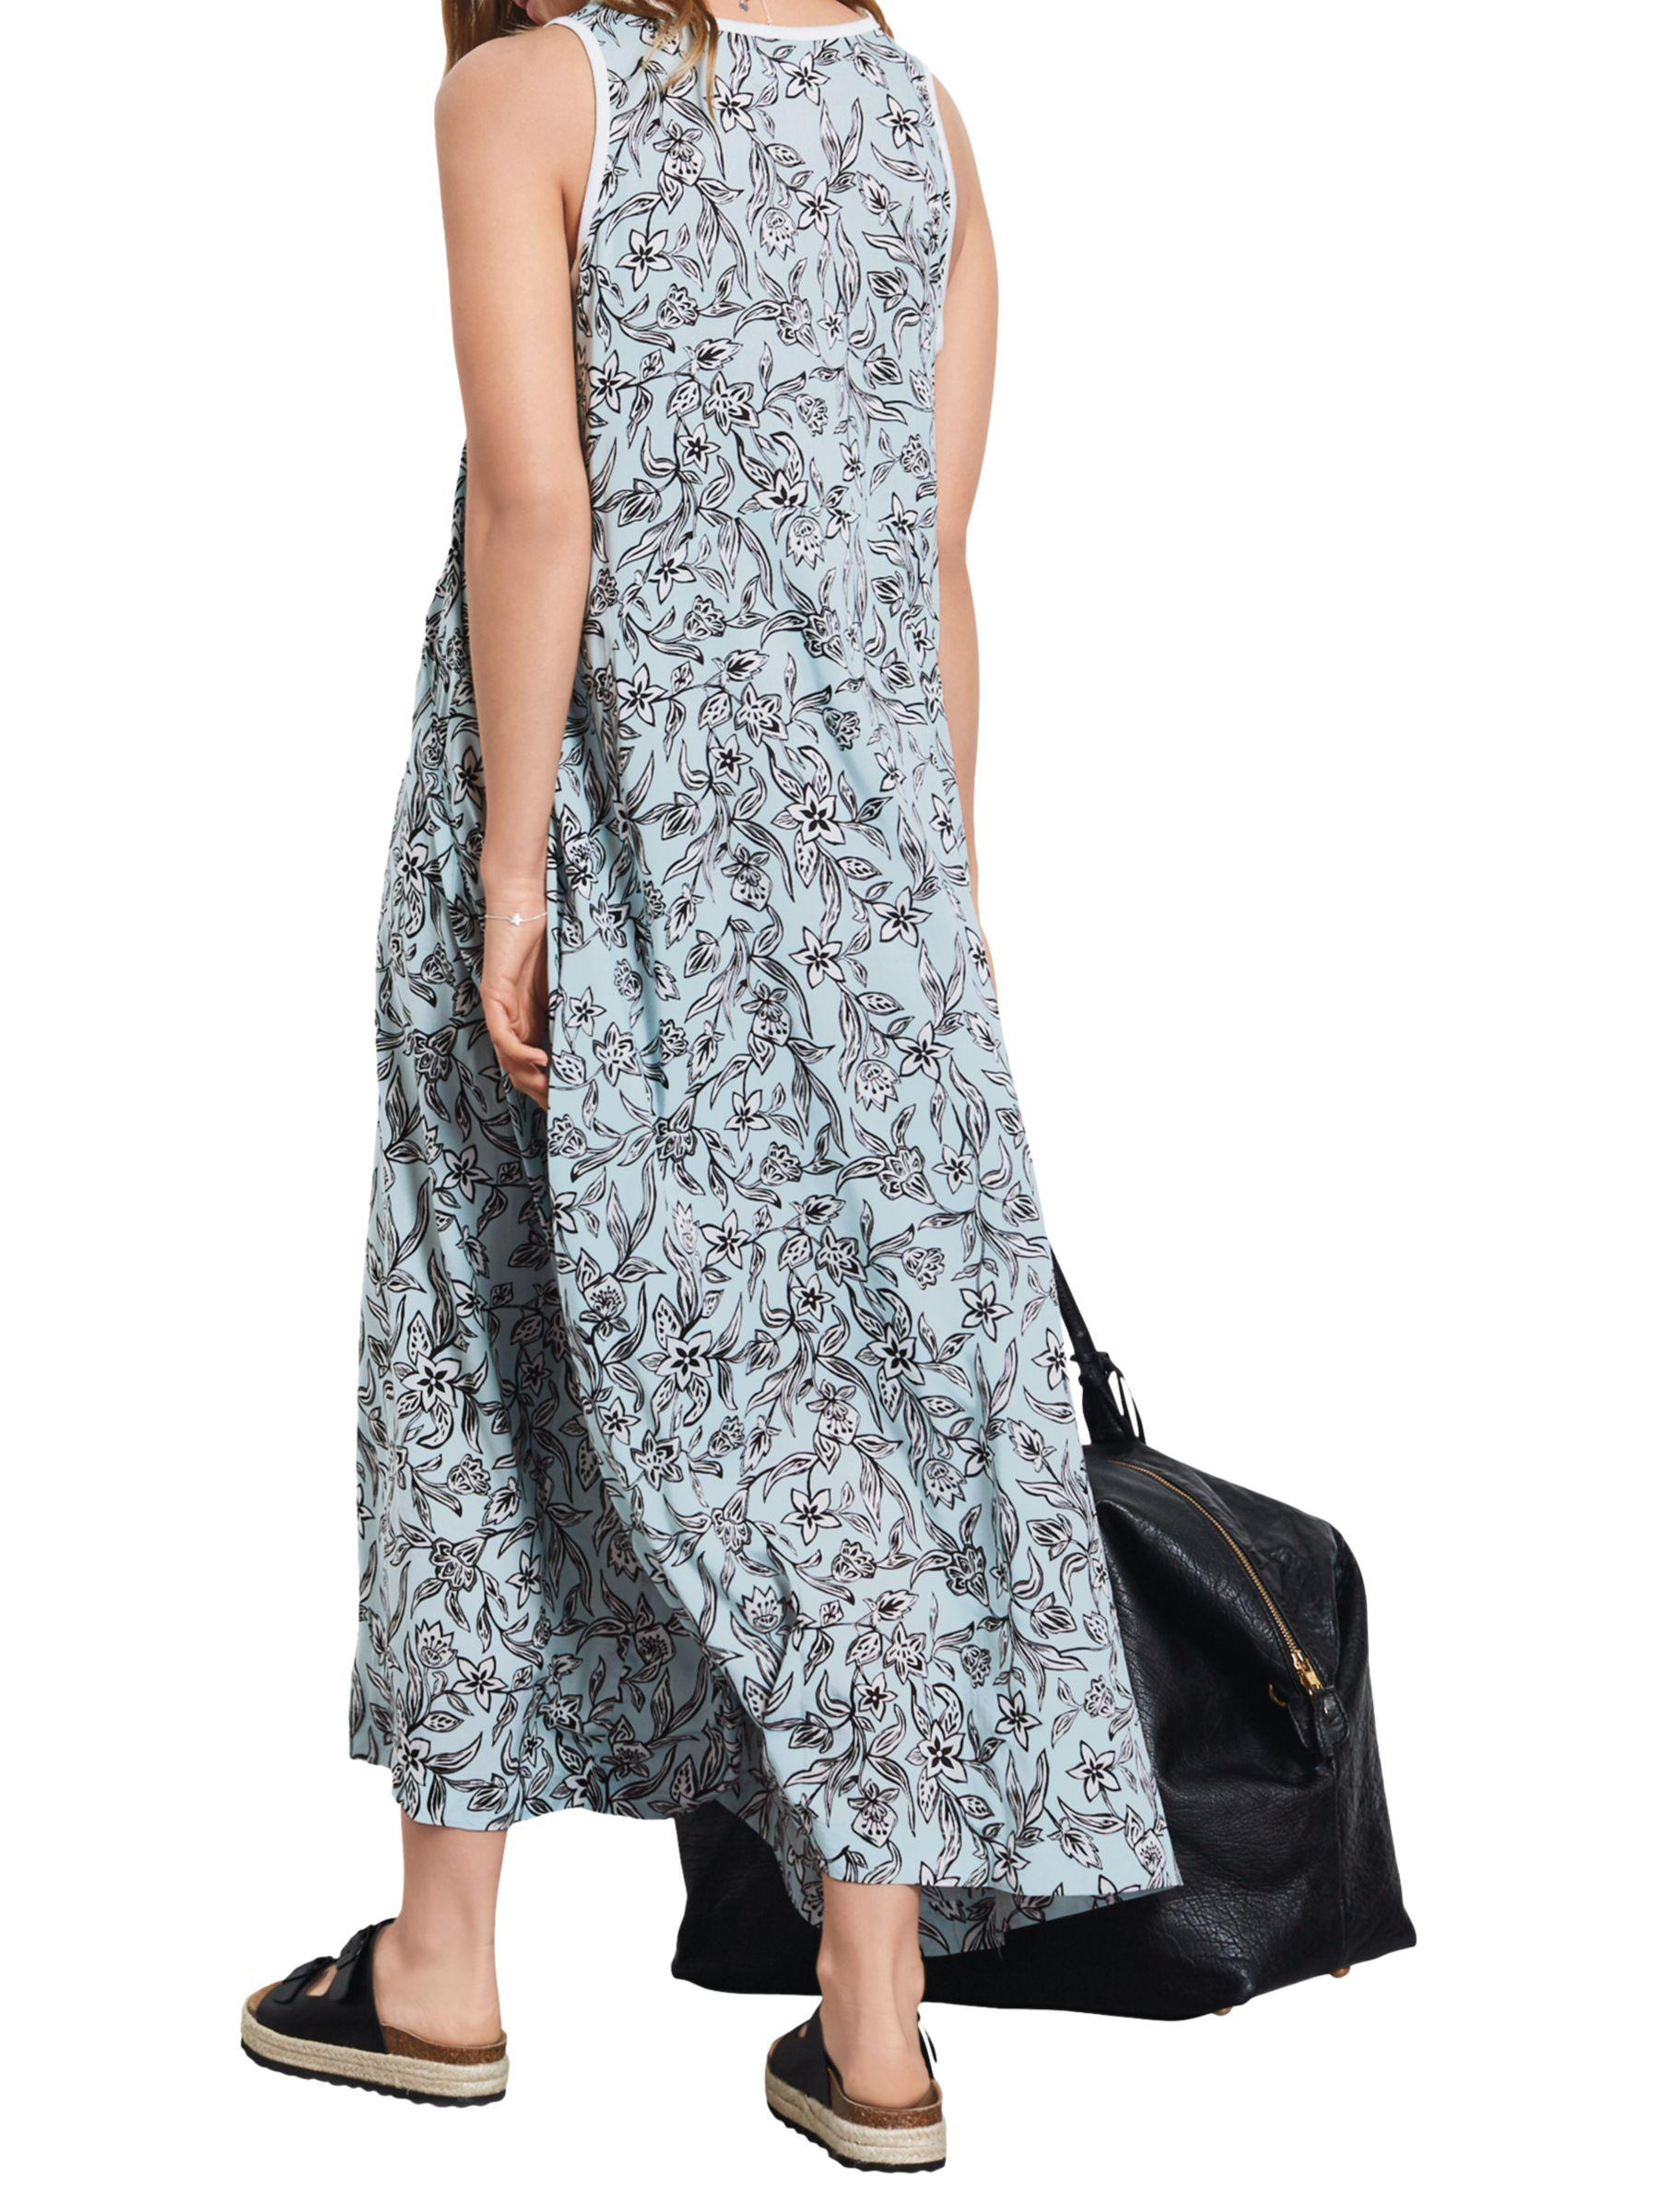 e89c6428fa1 John Lewis Hush Panel Maxi Dress in Blue - Lyst